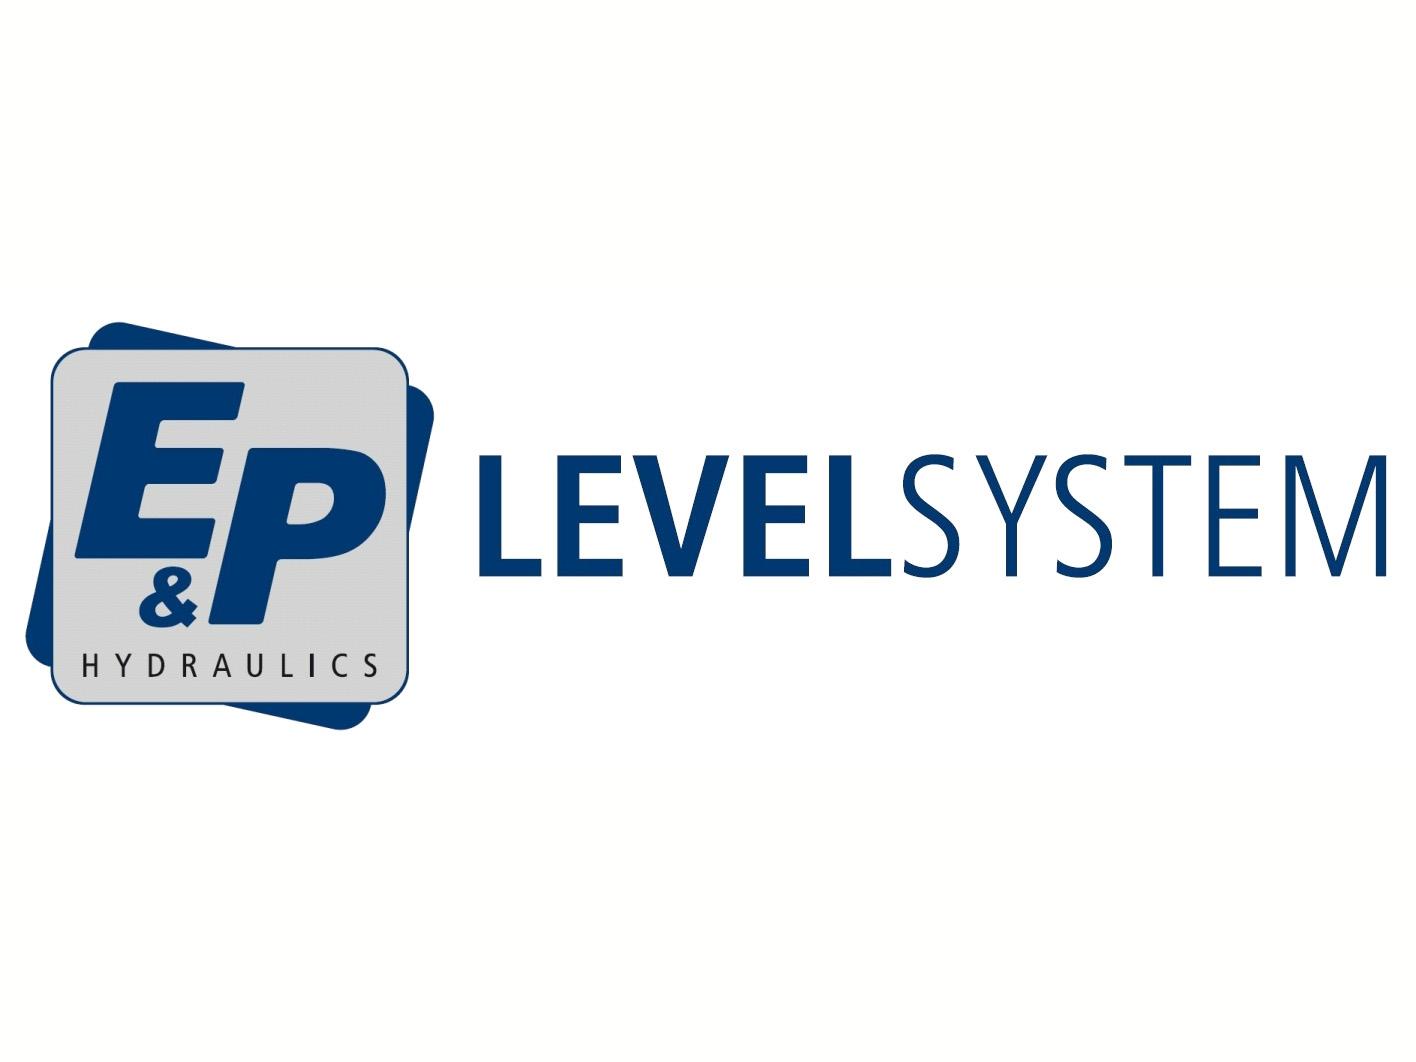 E&P Levelsystemen